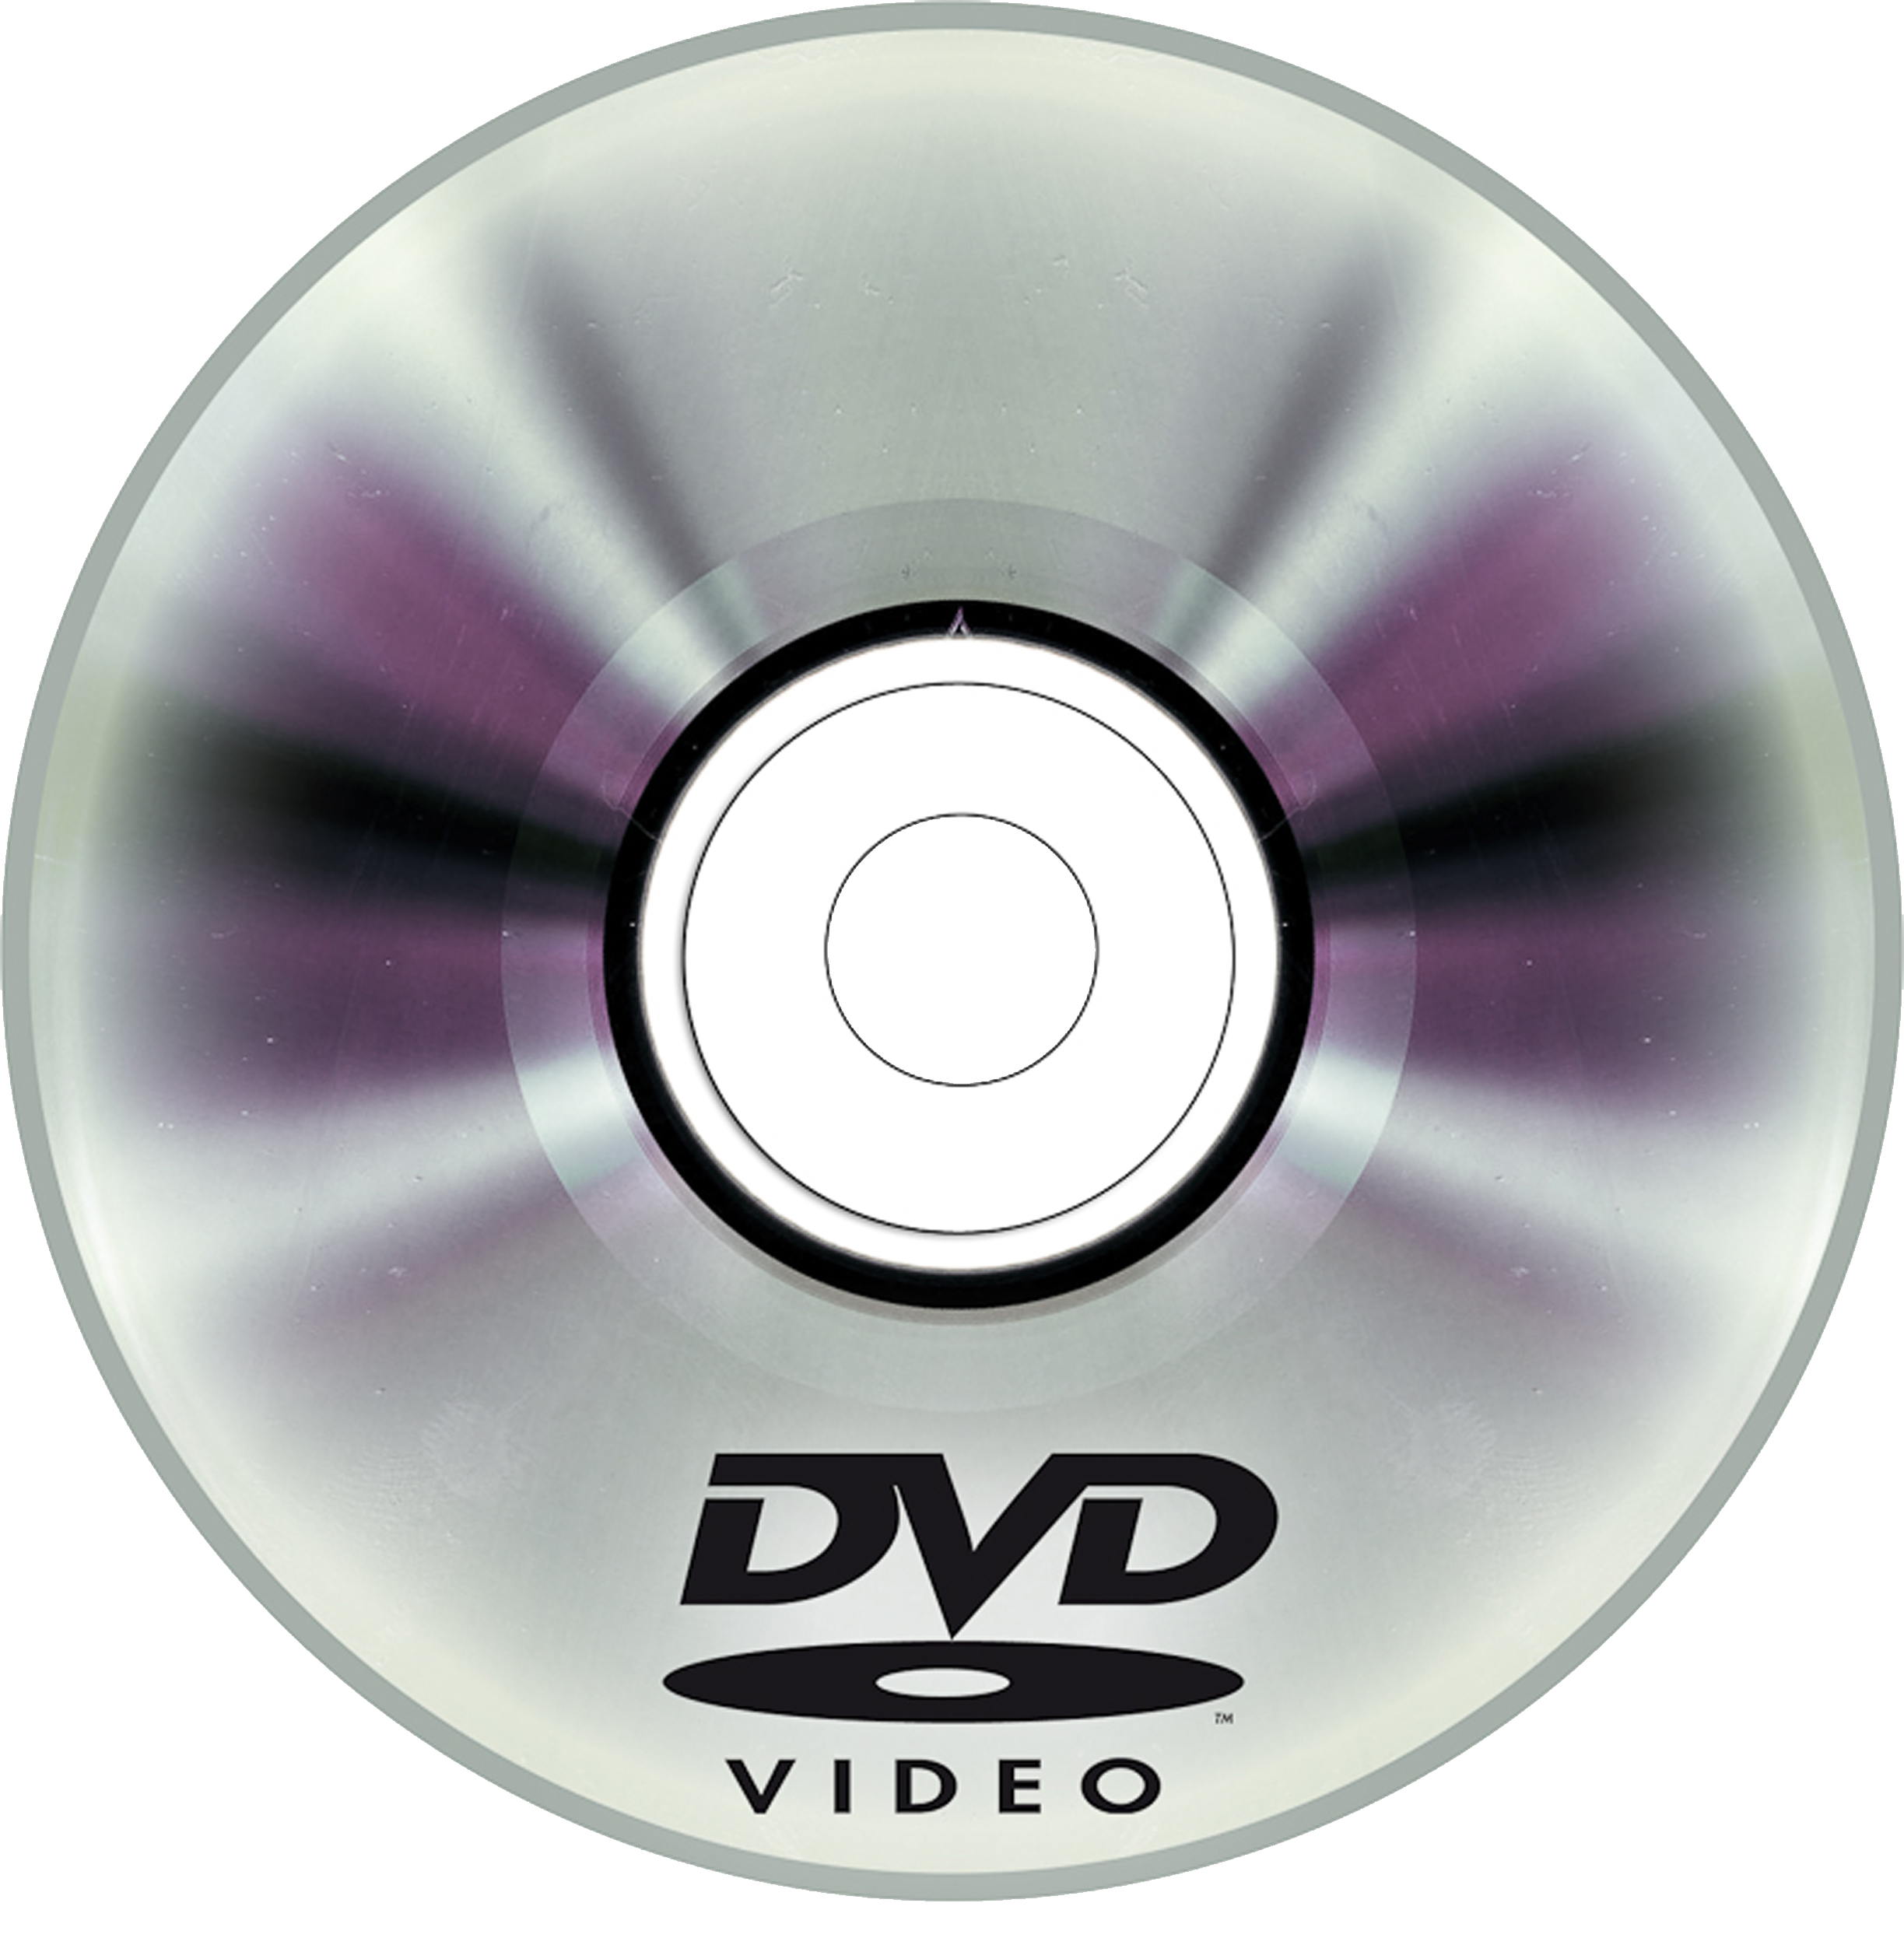 Cd | Dvd